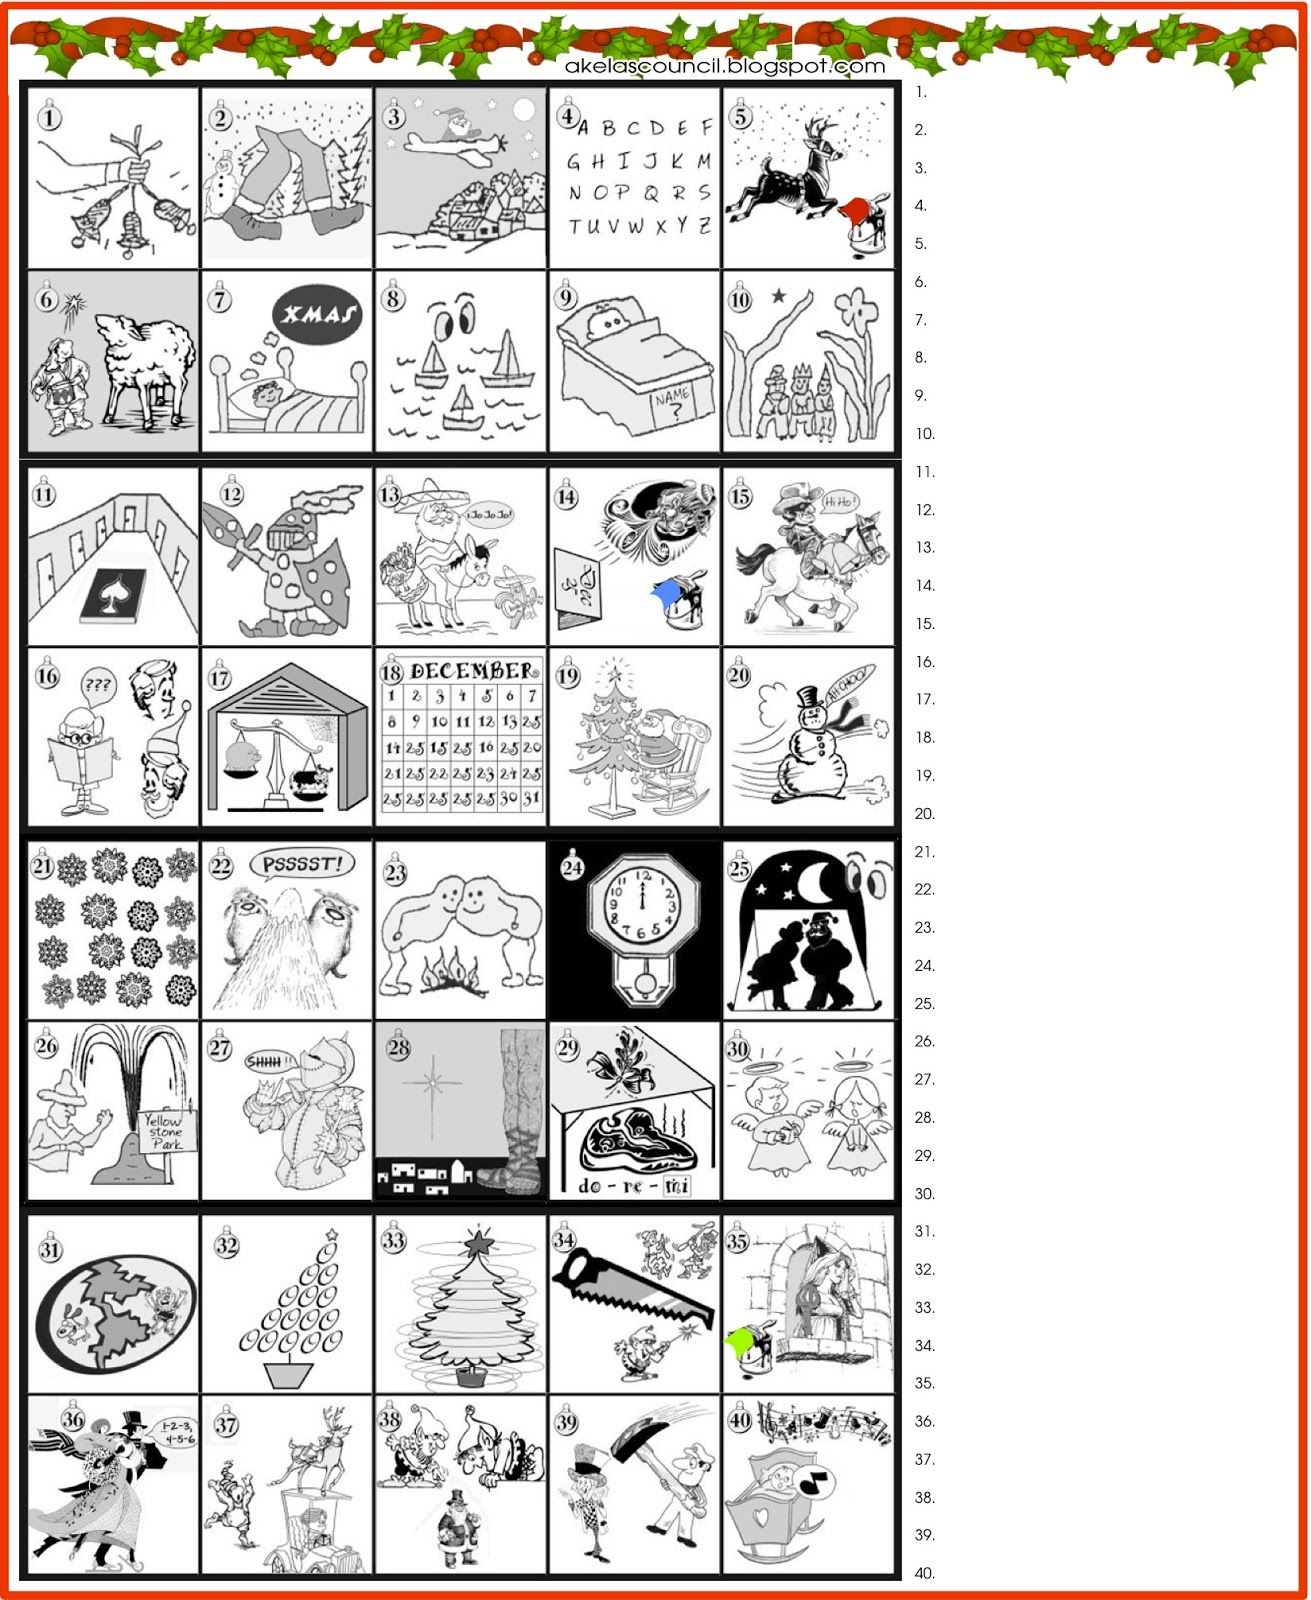 Printable * Guess The Christmas Songs Or Carols Word Puzzle - Free Printable Christmas Puzzles